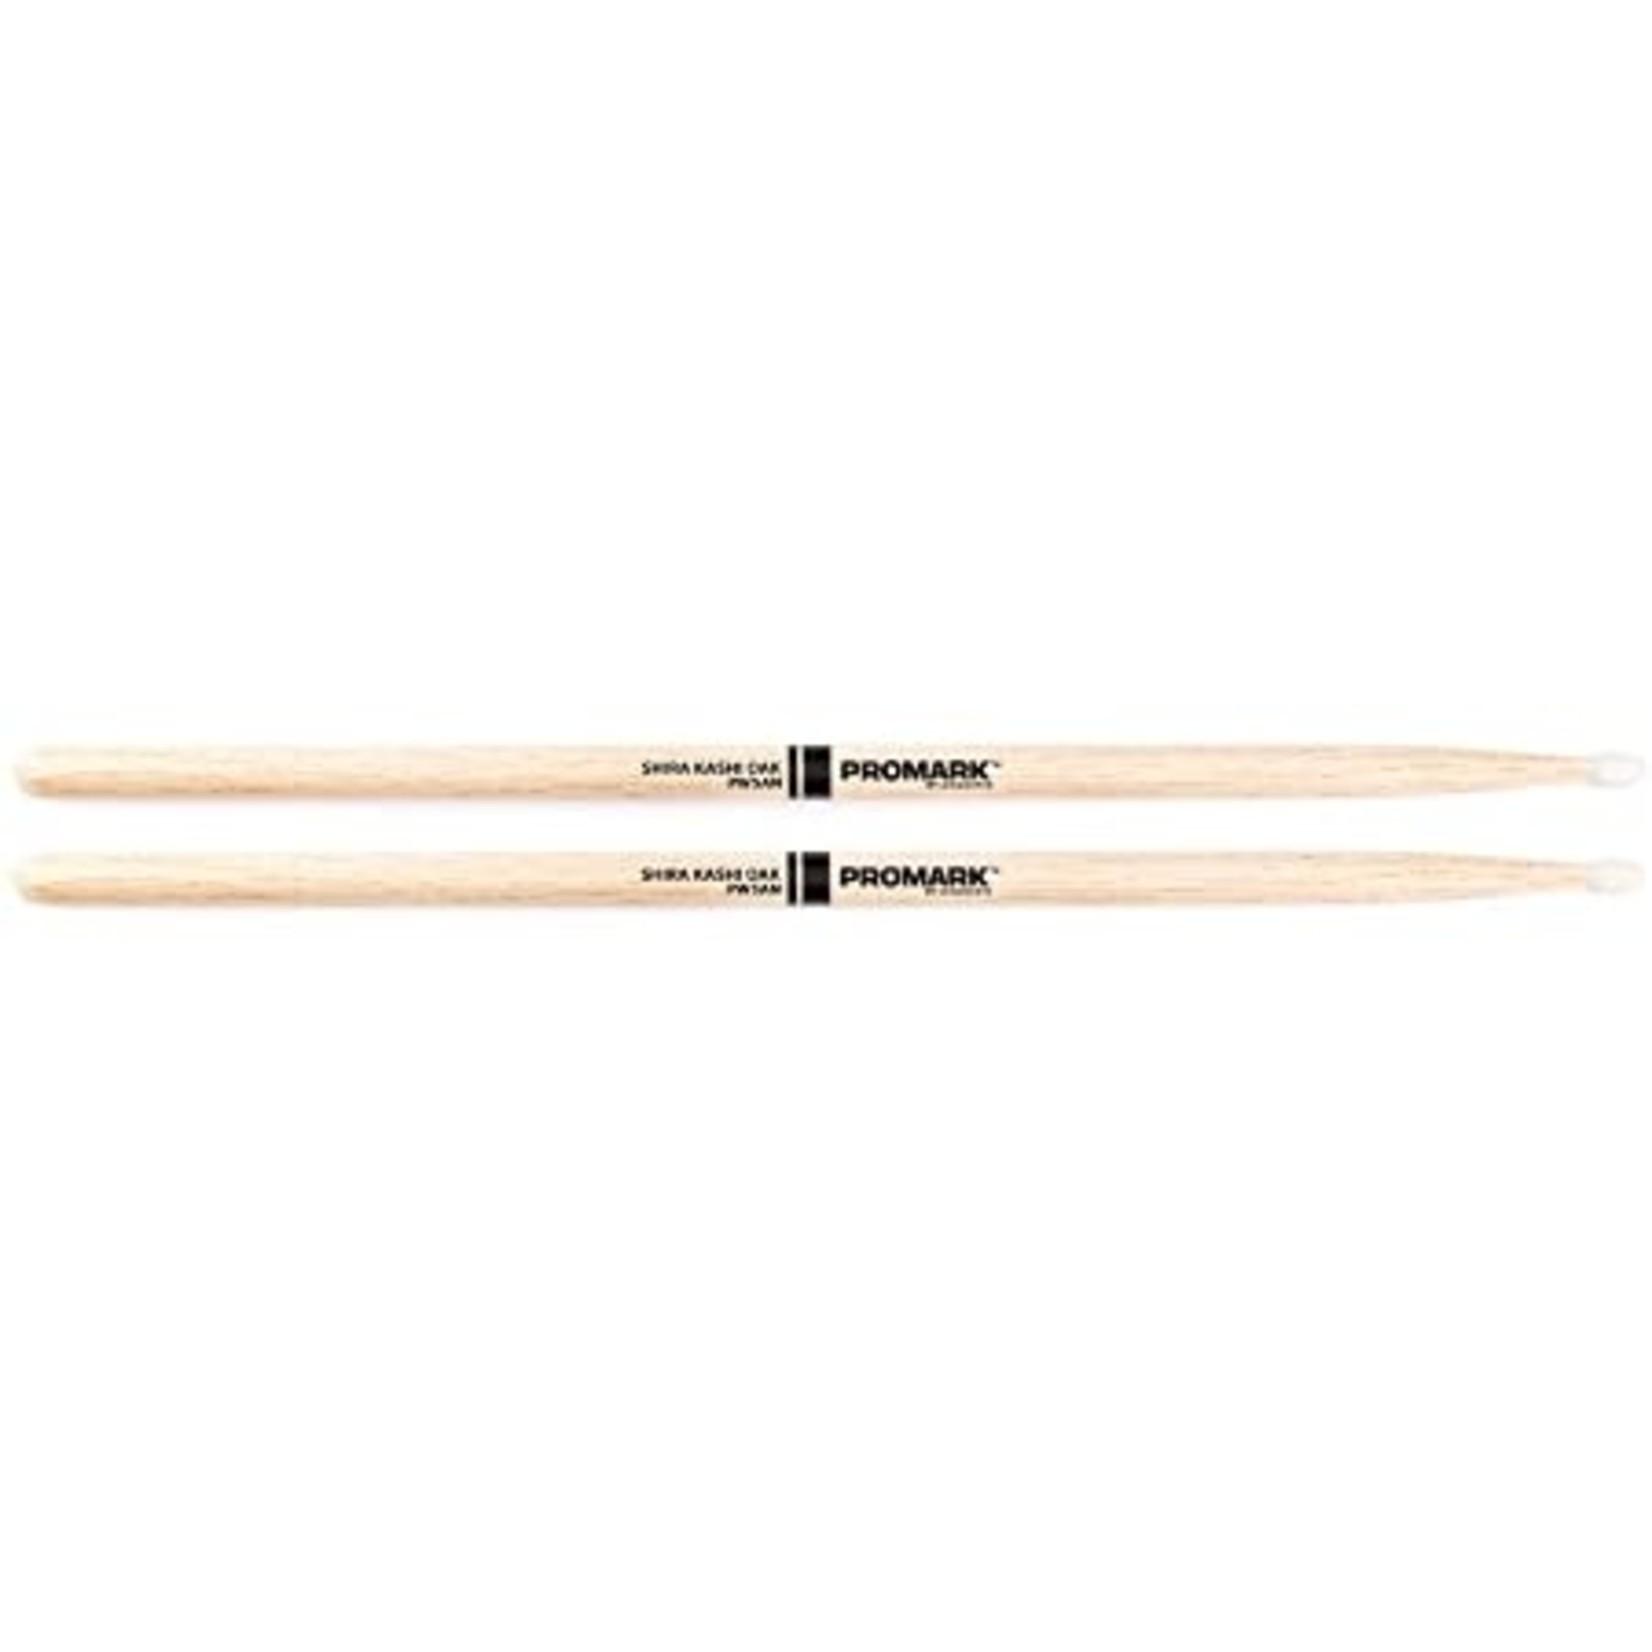 Promark ProMark Classic Shira Kashi Oak Attack 5A Nylon Tip Drumstick